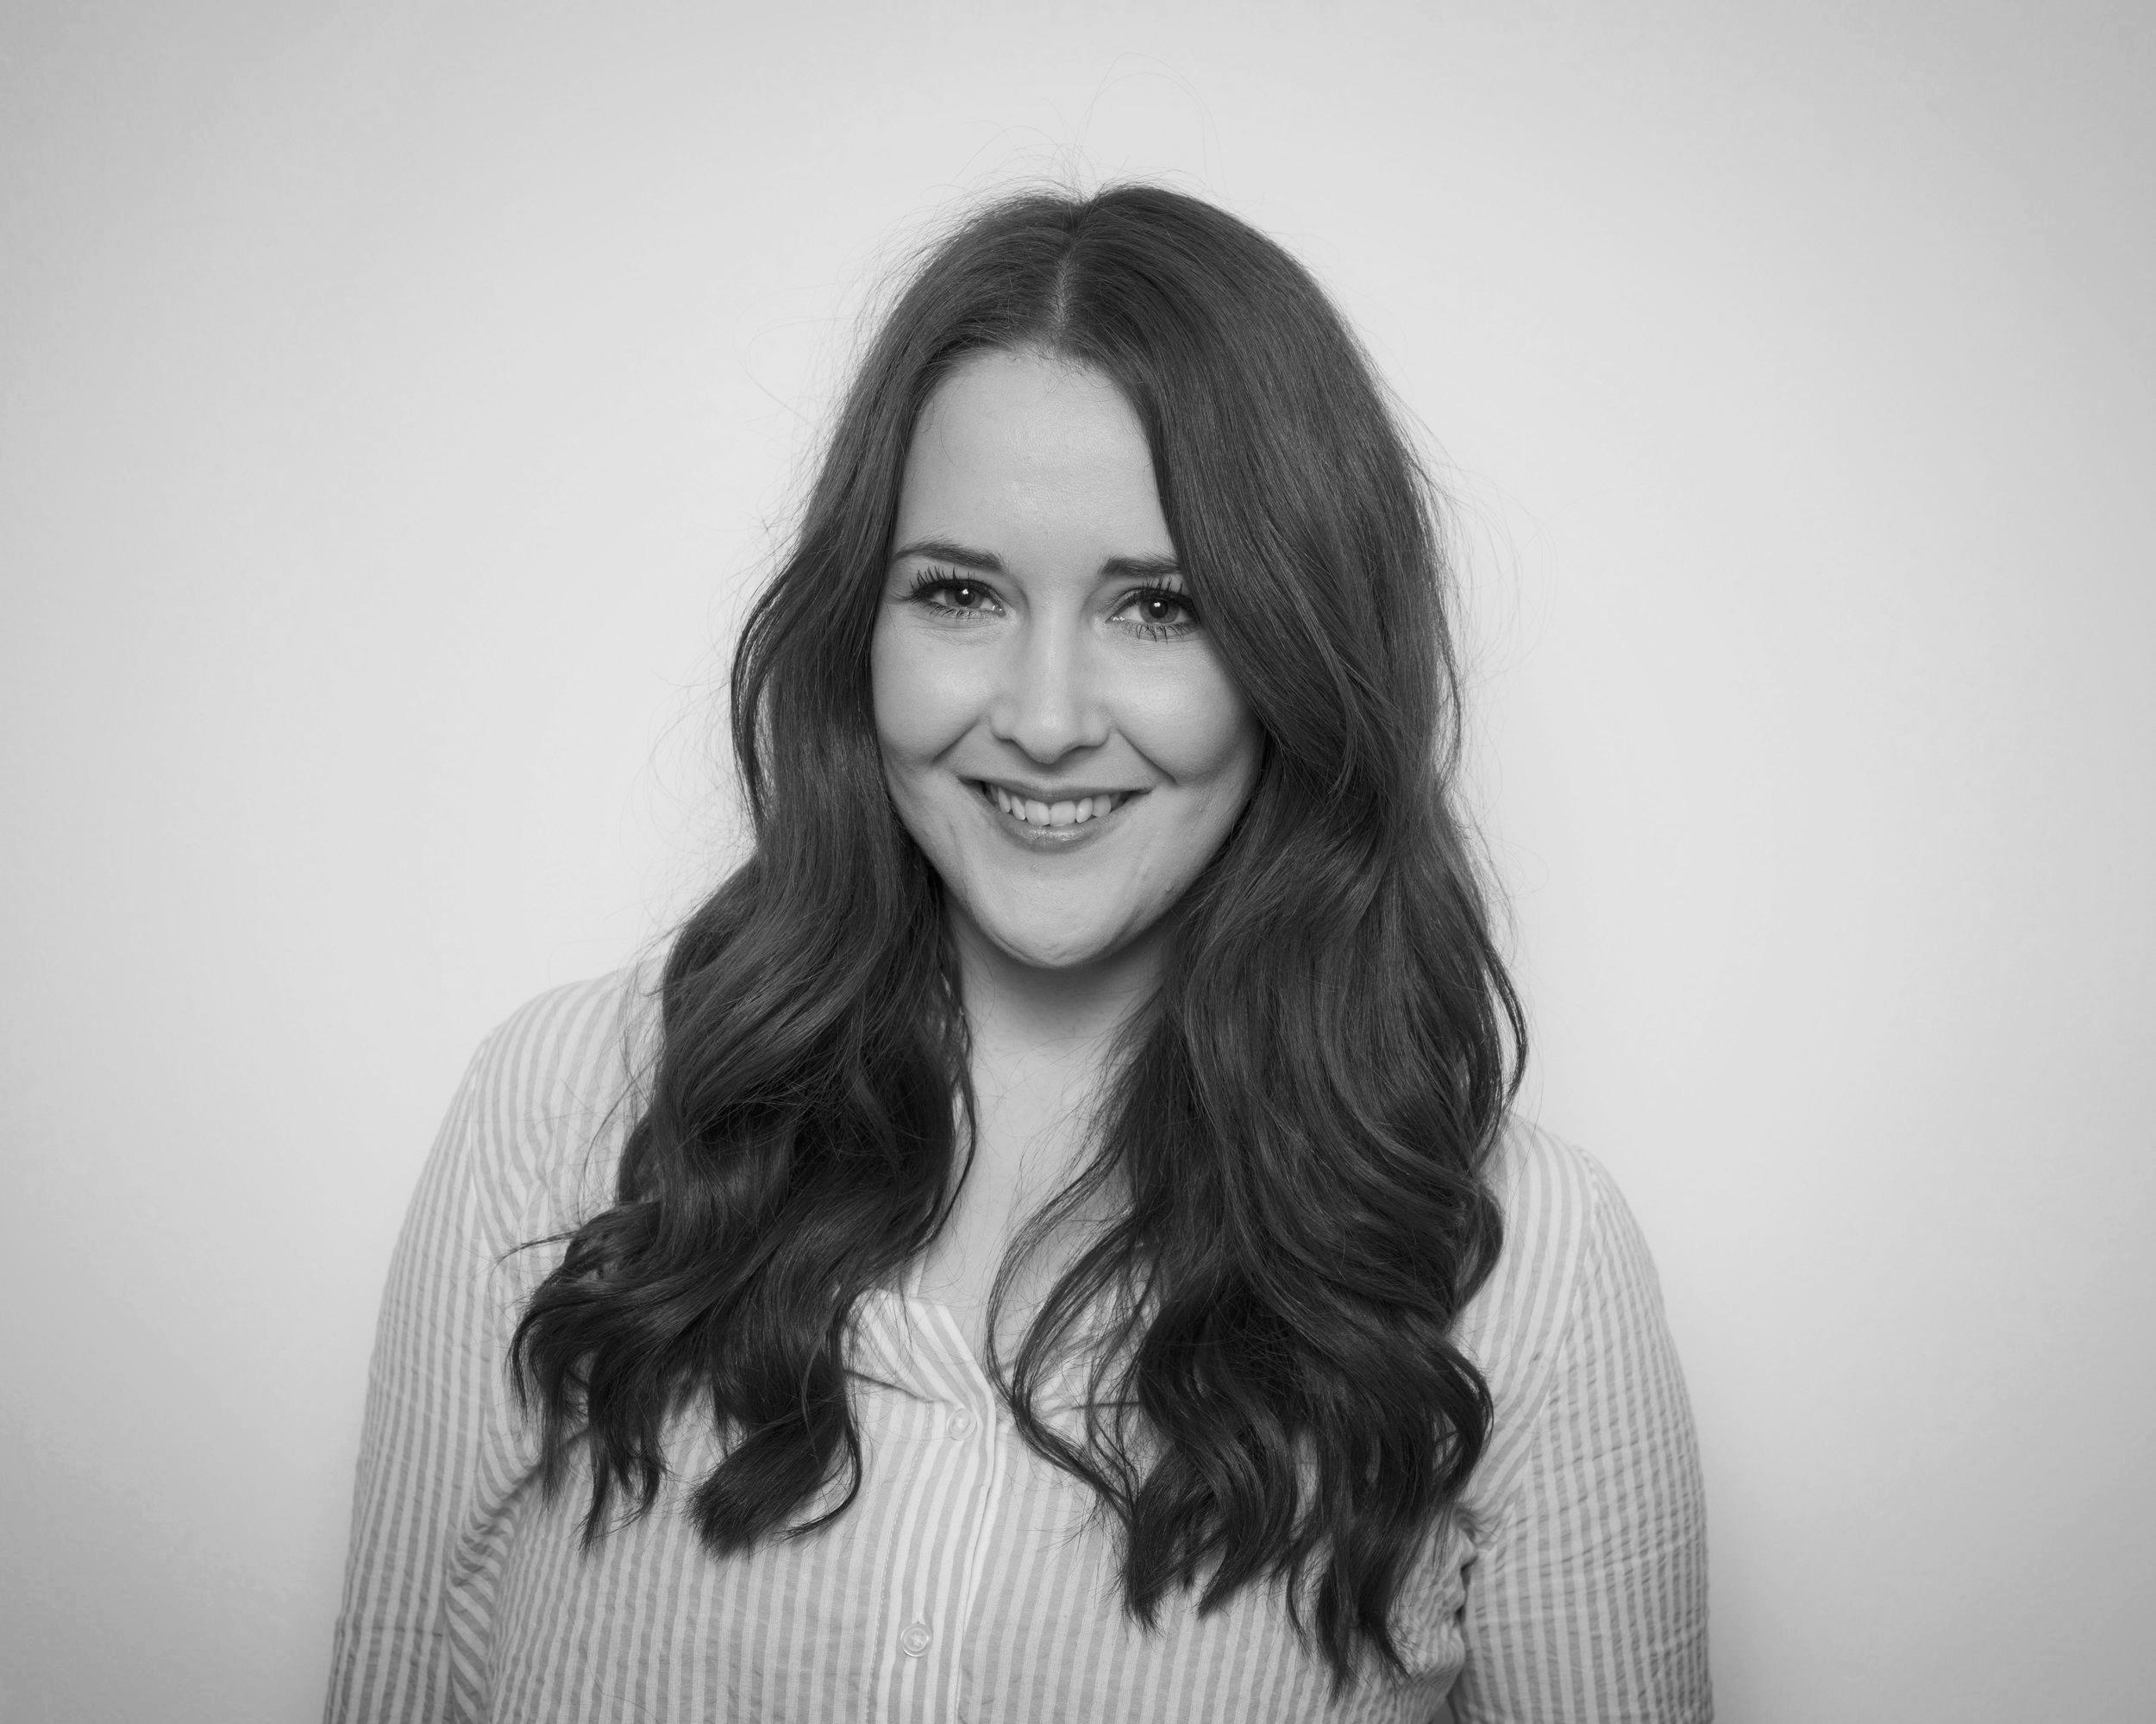 <b>Lauren O'Neill</b><br>Content Executive